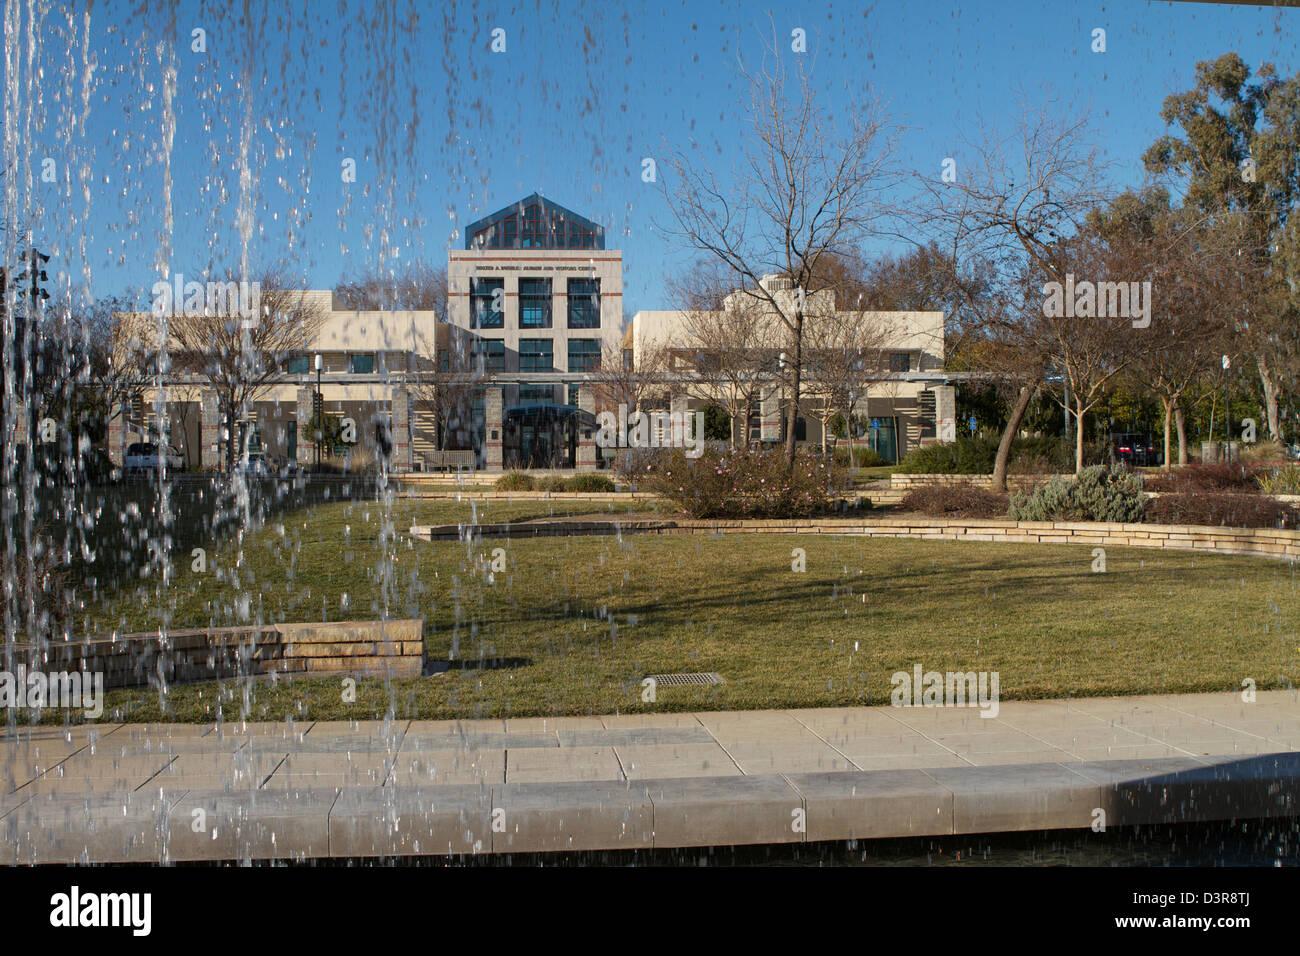 The Walter A Buehler Alumni and Visitors Center at the University of California Davis (UC Davis) - Stock Image